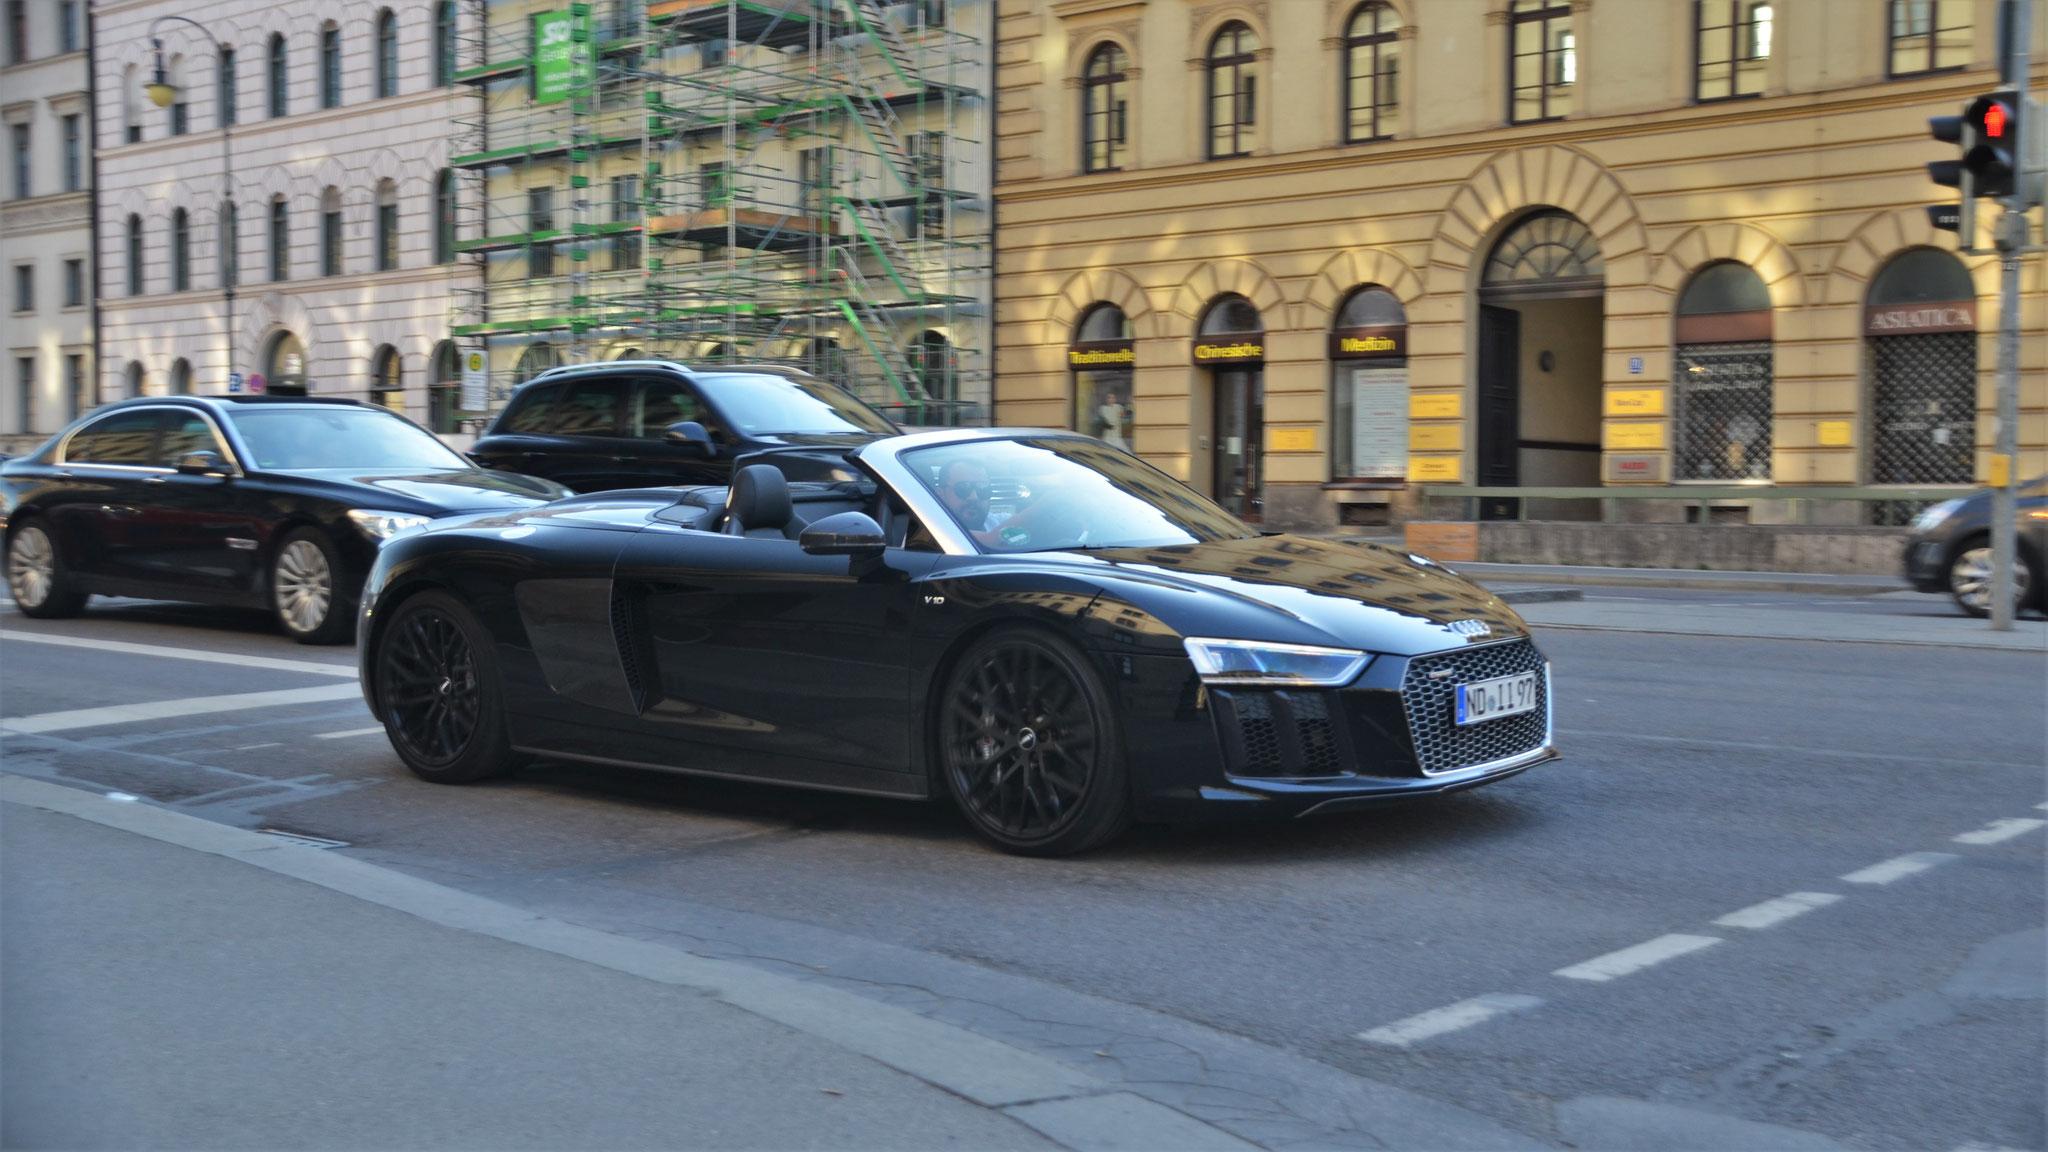 Audi R8 V10 Spyder - ND-II-97